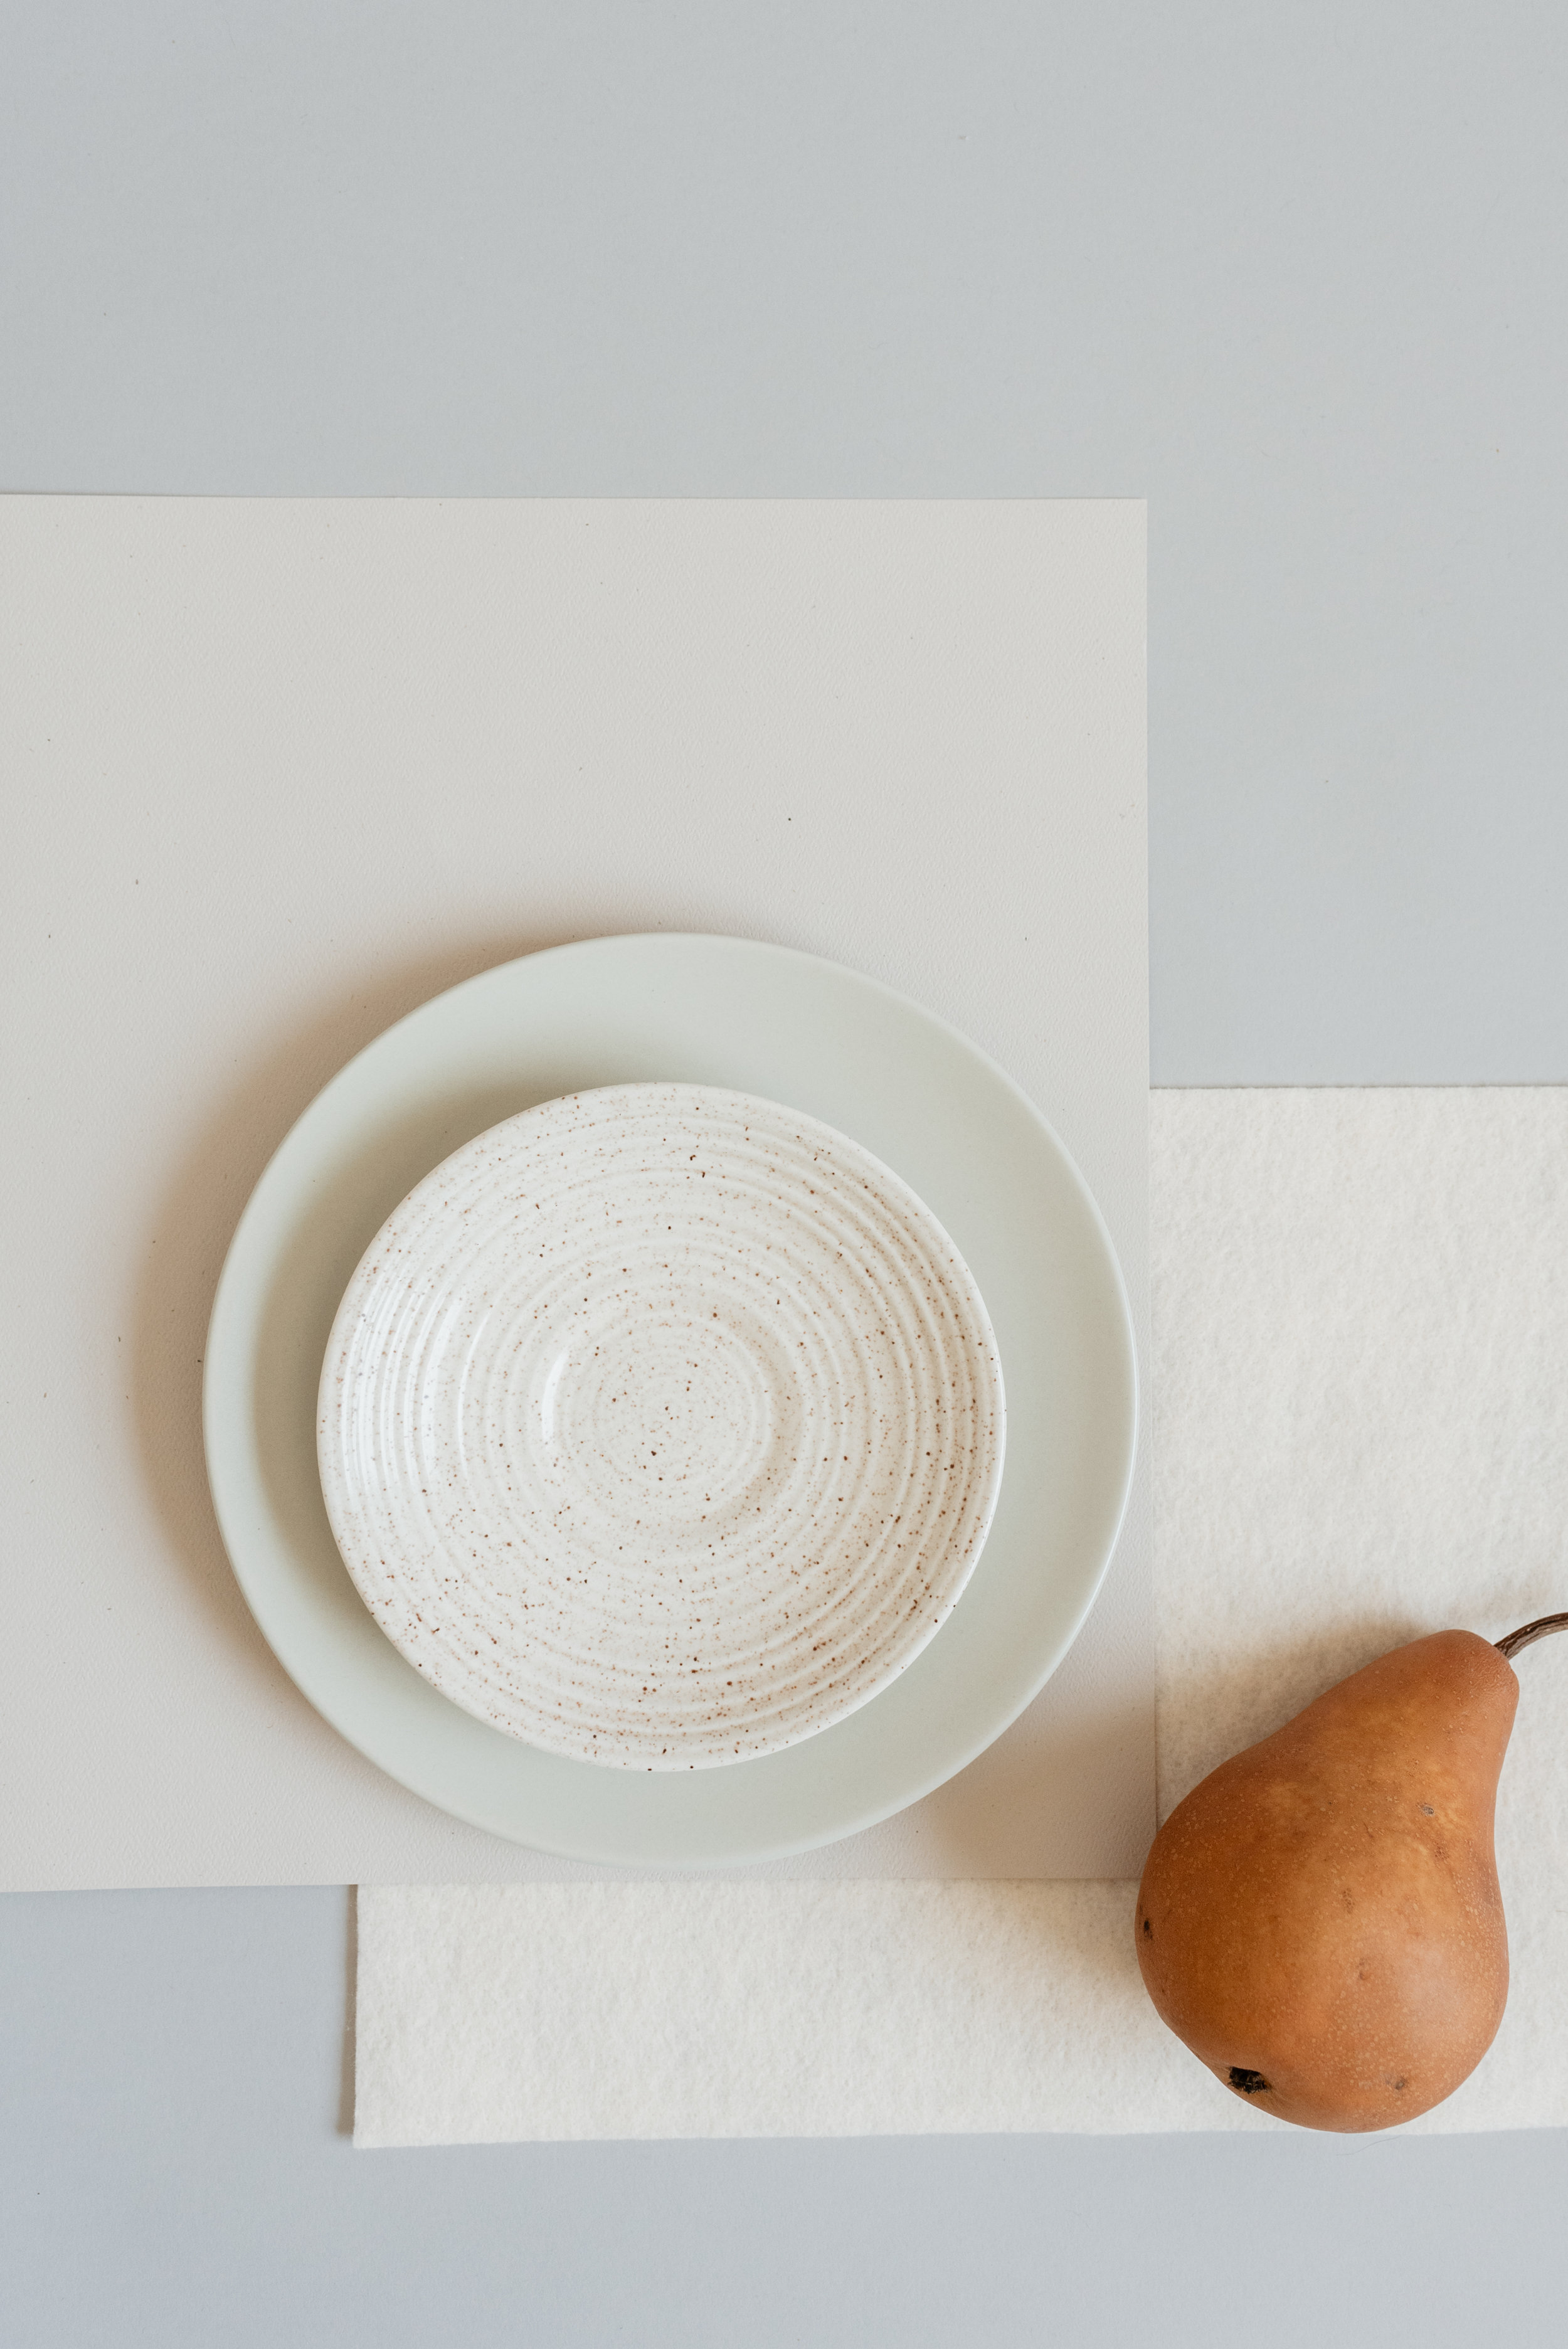 pastel-plates-52.jpg